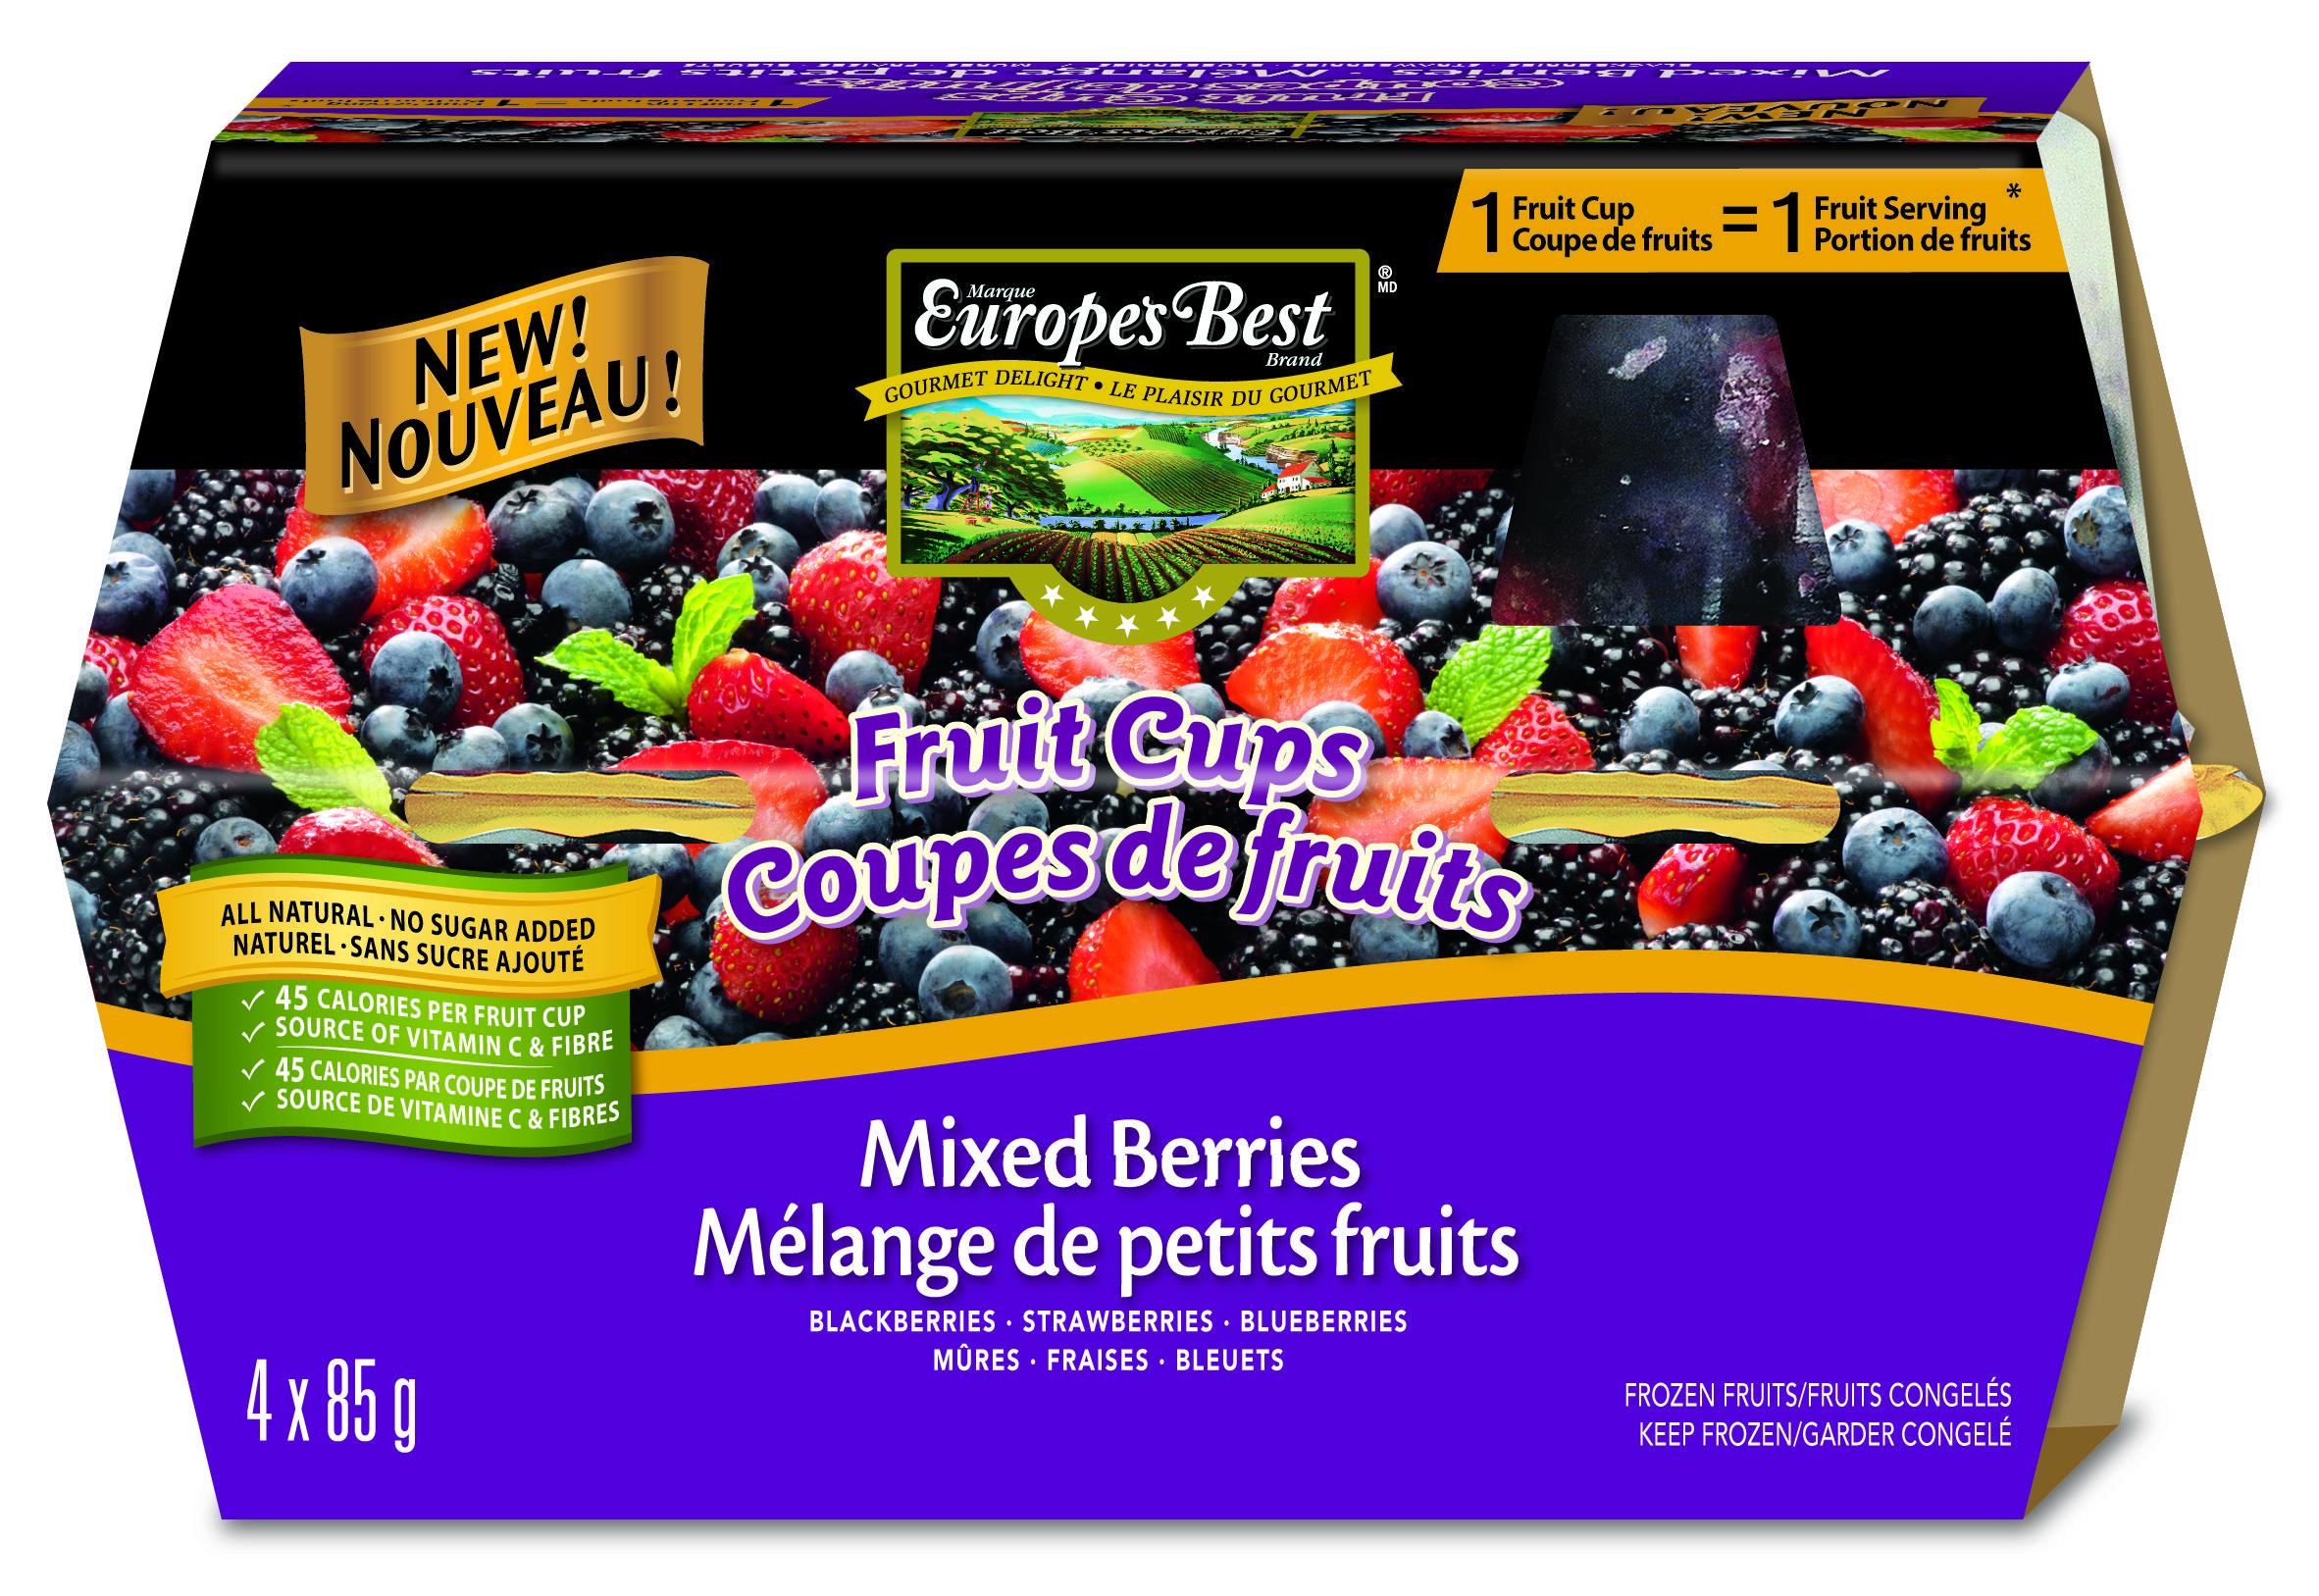 HAIN CELESTIAL CANADA / Europe's Best® Fruit Cups Fruit